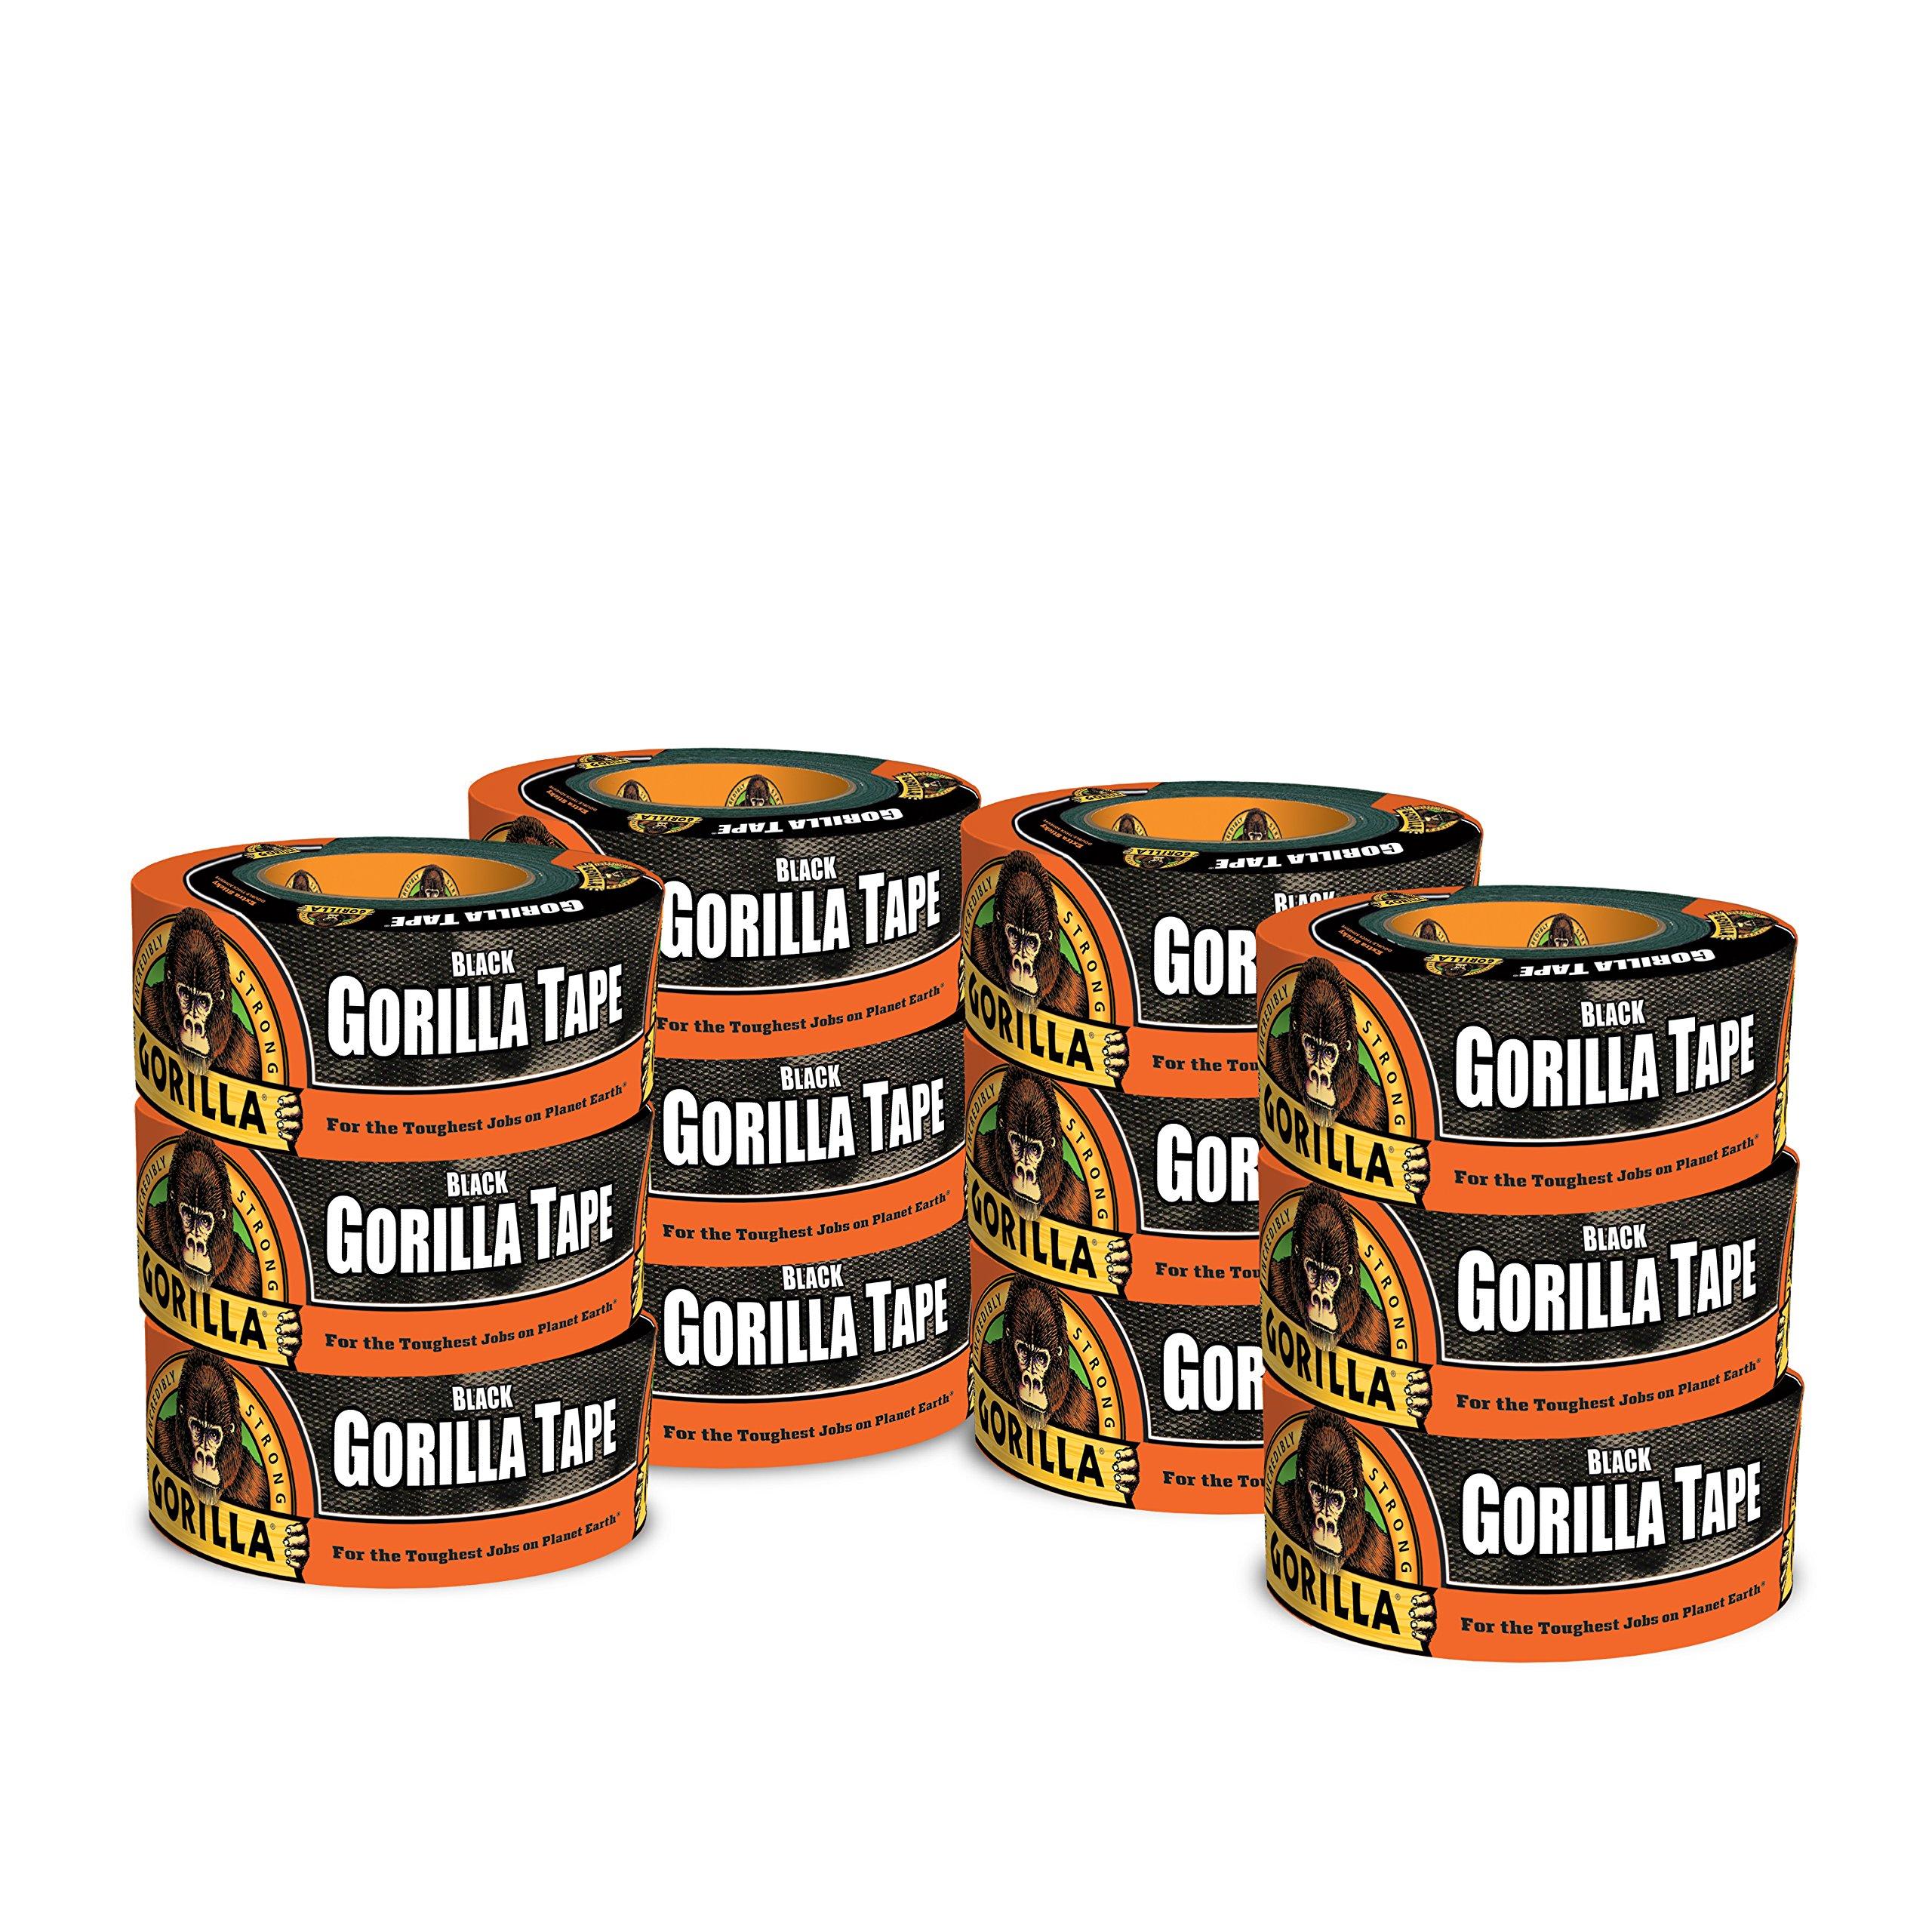 Gorilla Tape, Black Duct Tape, 1.88'' x 12 yd, Black, (Pack of 12)